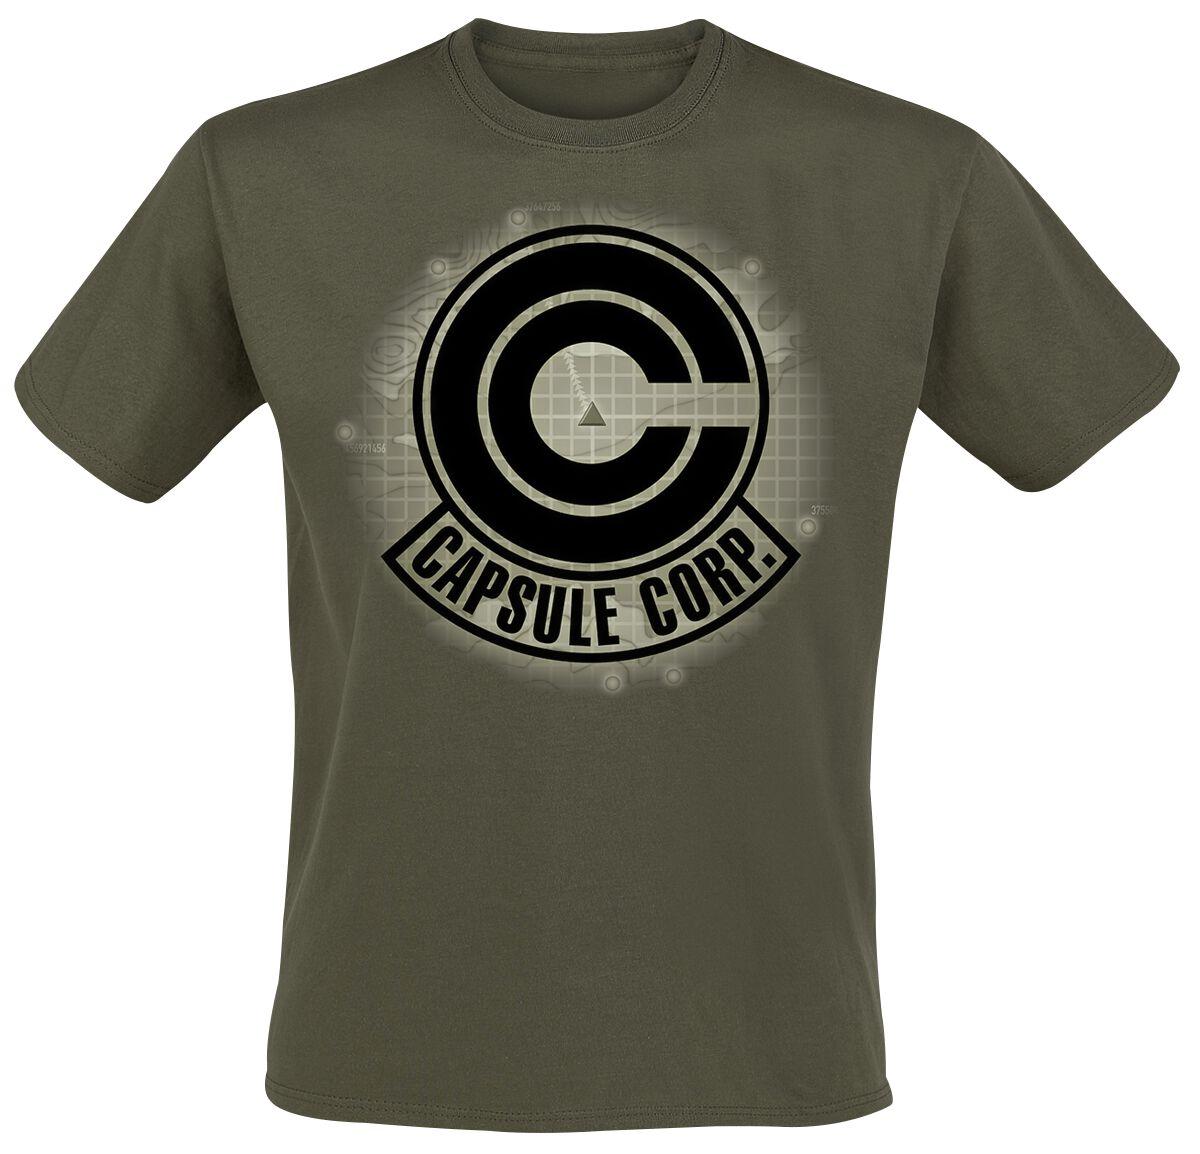 Merch dla Fanów - Koszulki - T-Shirt Dragon Ball Z - Capsule Corp. T-Shirt khaki - 361086